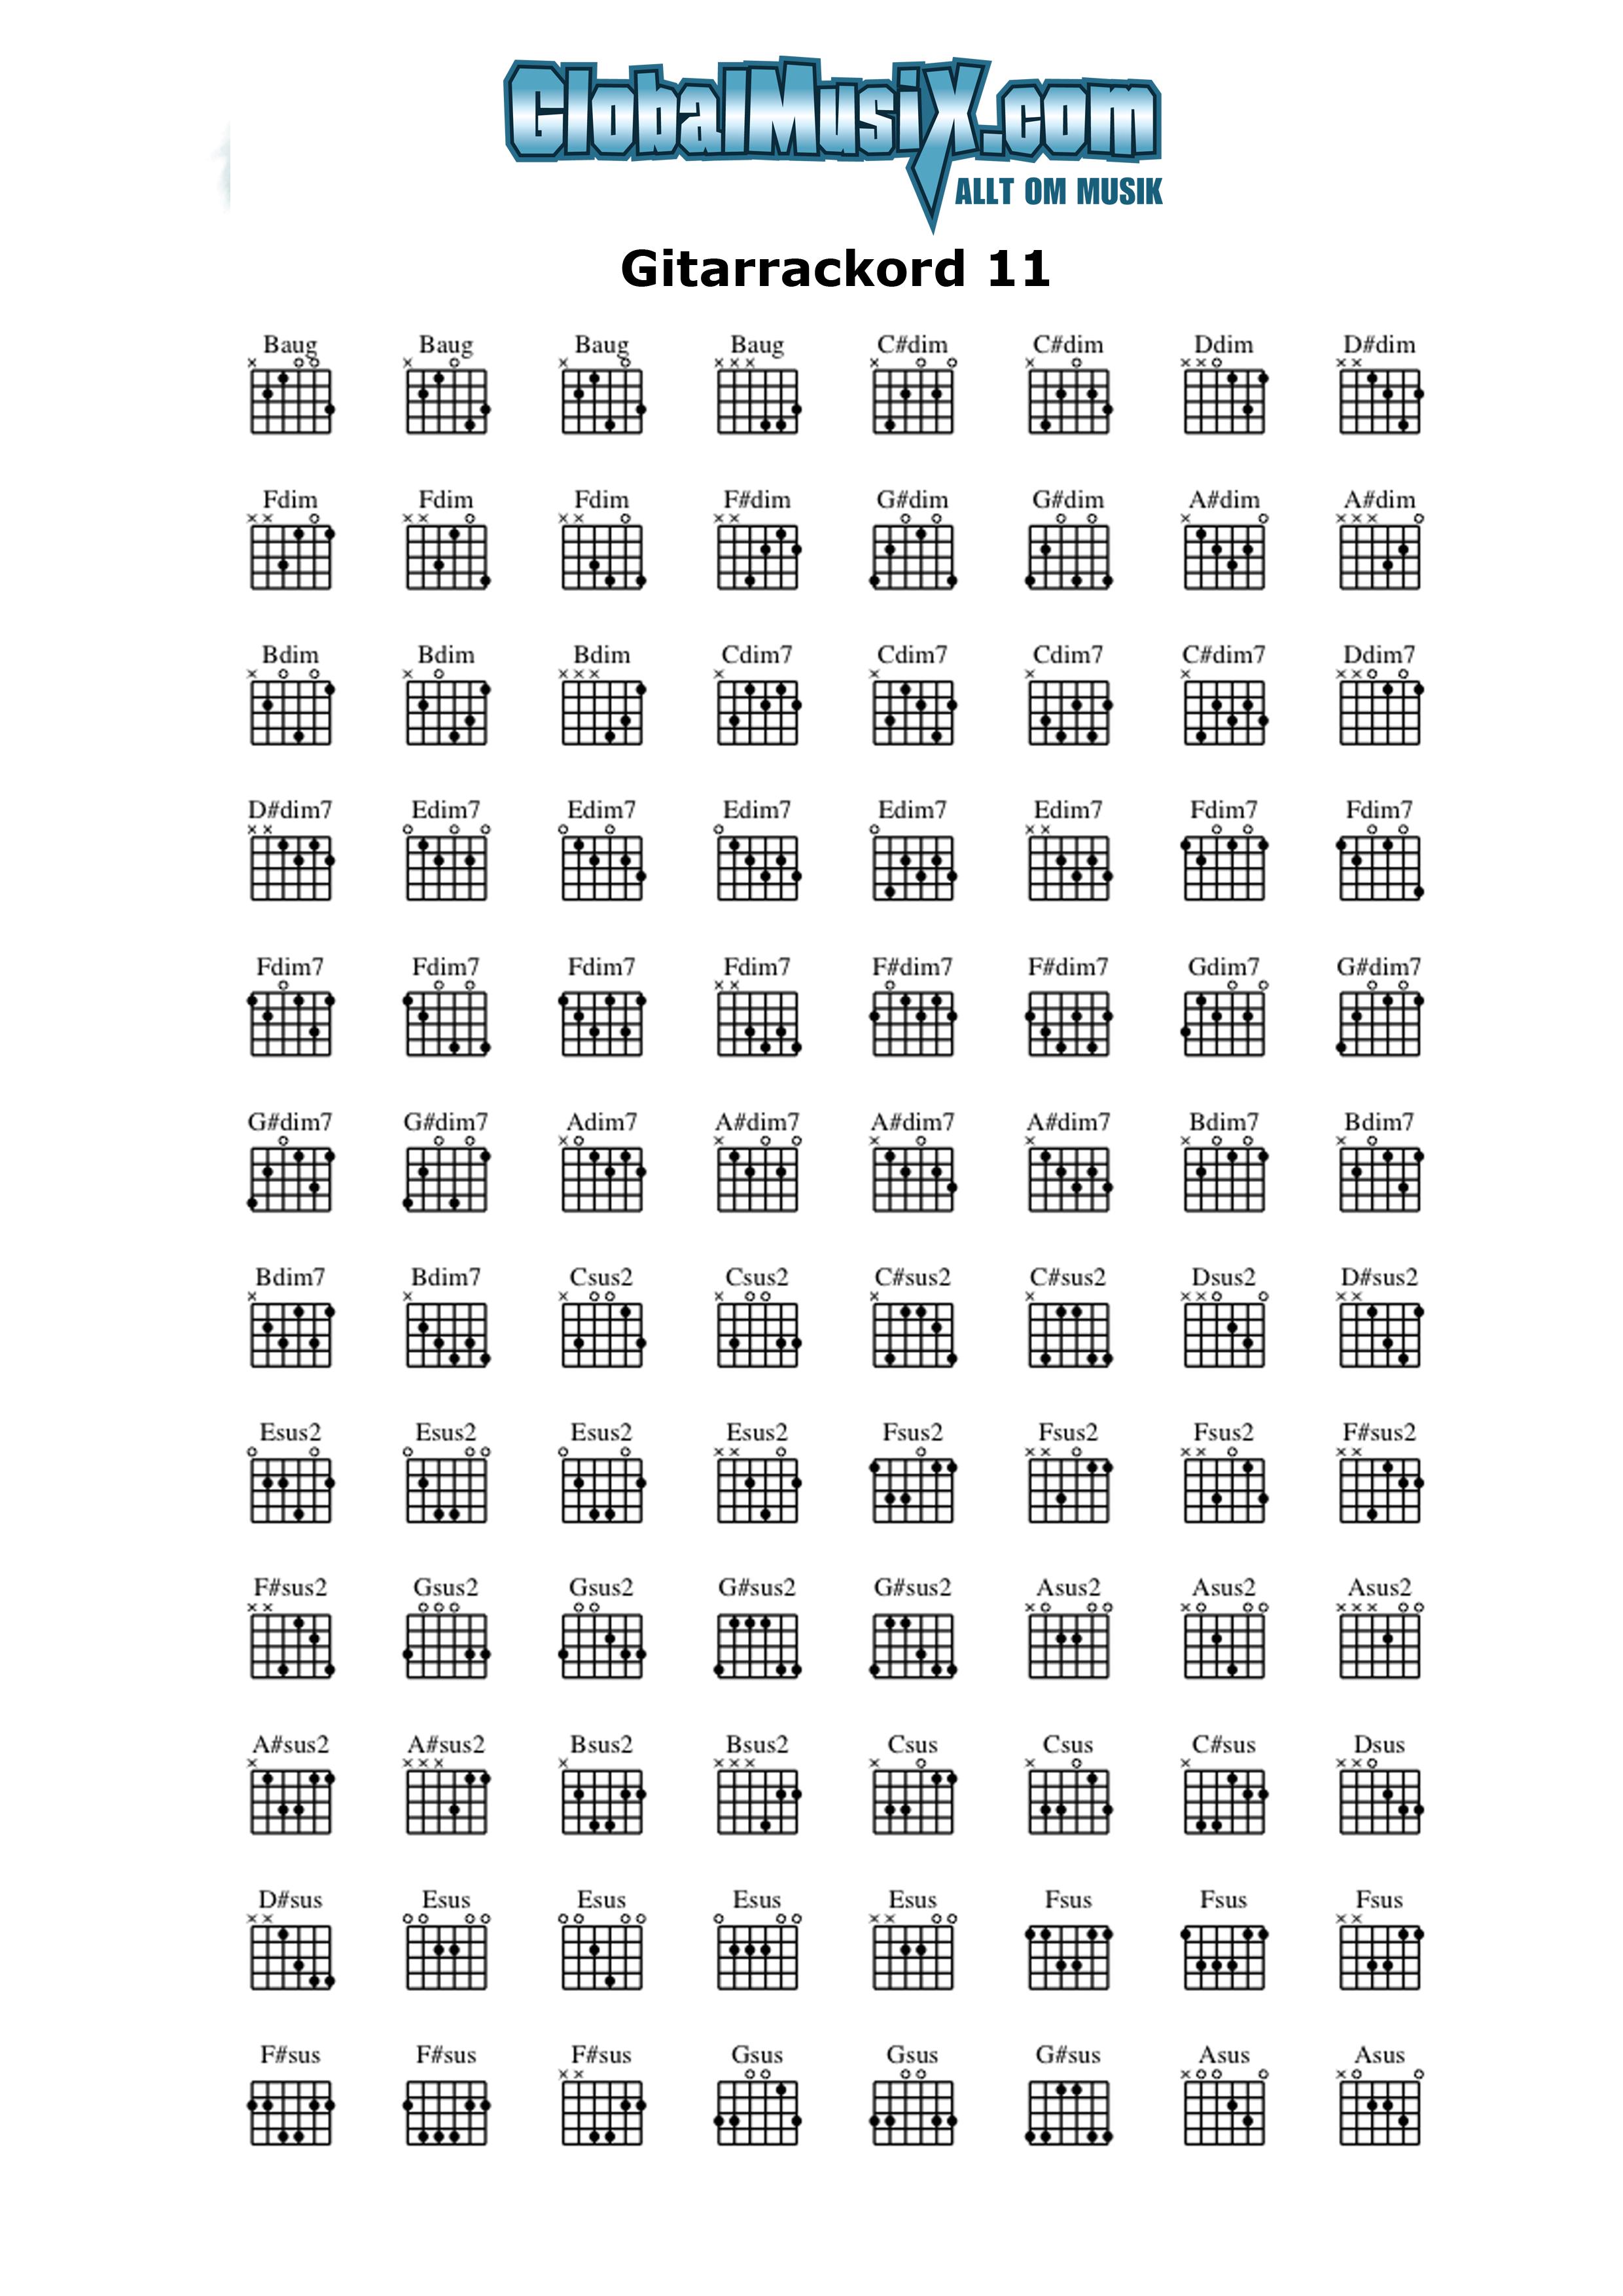 Asus7 guitar chord choice image guitar chords examples asus7 guitar chord gallery guitar chords examples asus chord g wallskid gitarrackord baug till asusglobalmusixcom fatherlandz hexwebz Image collections